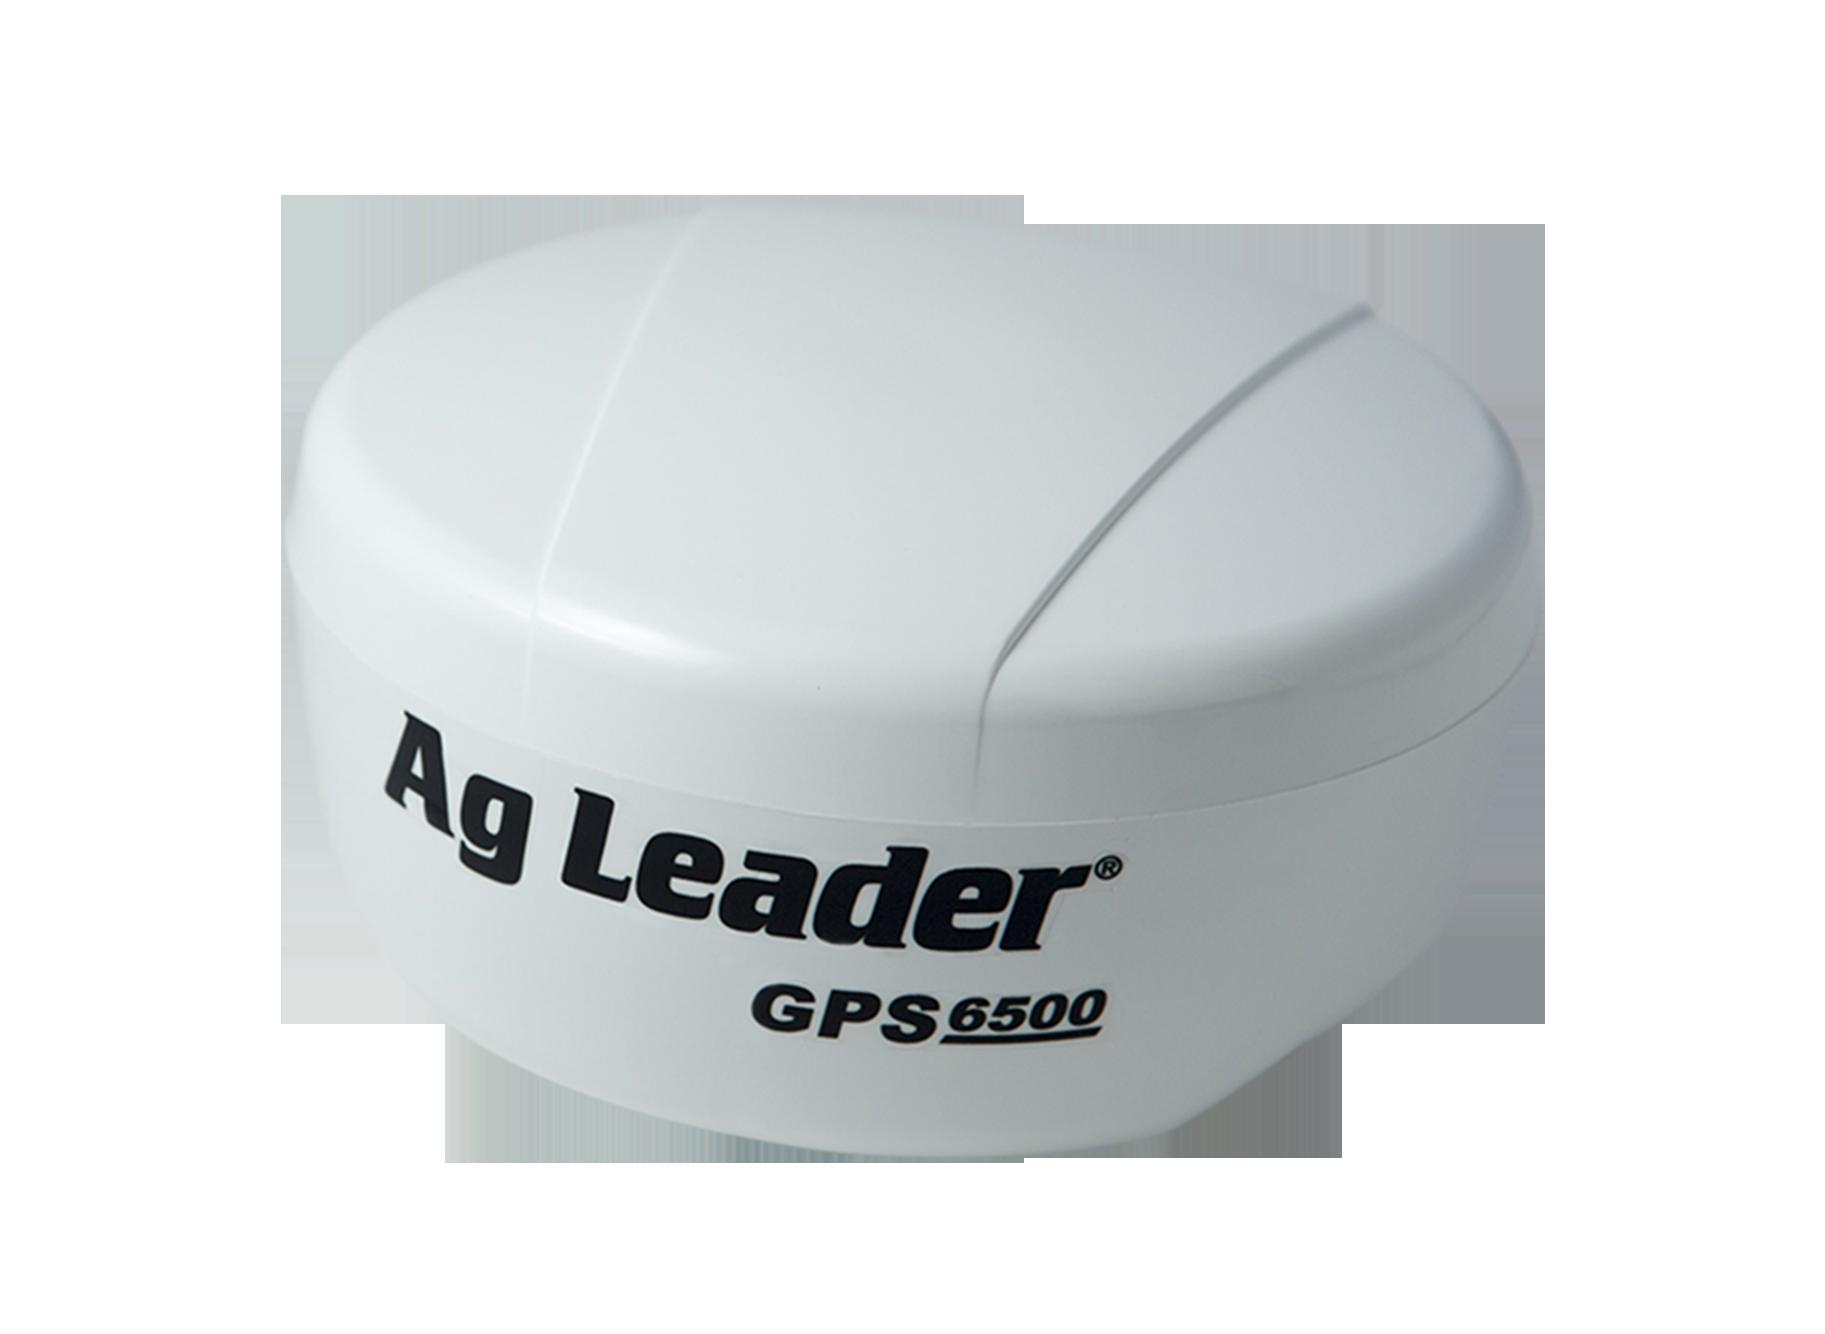 GPS6500